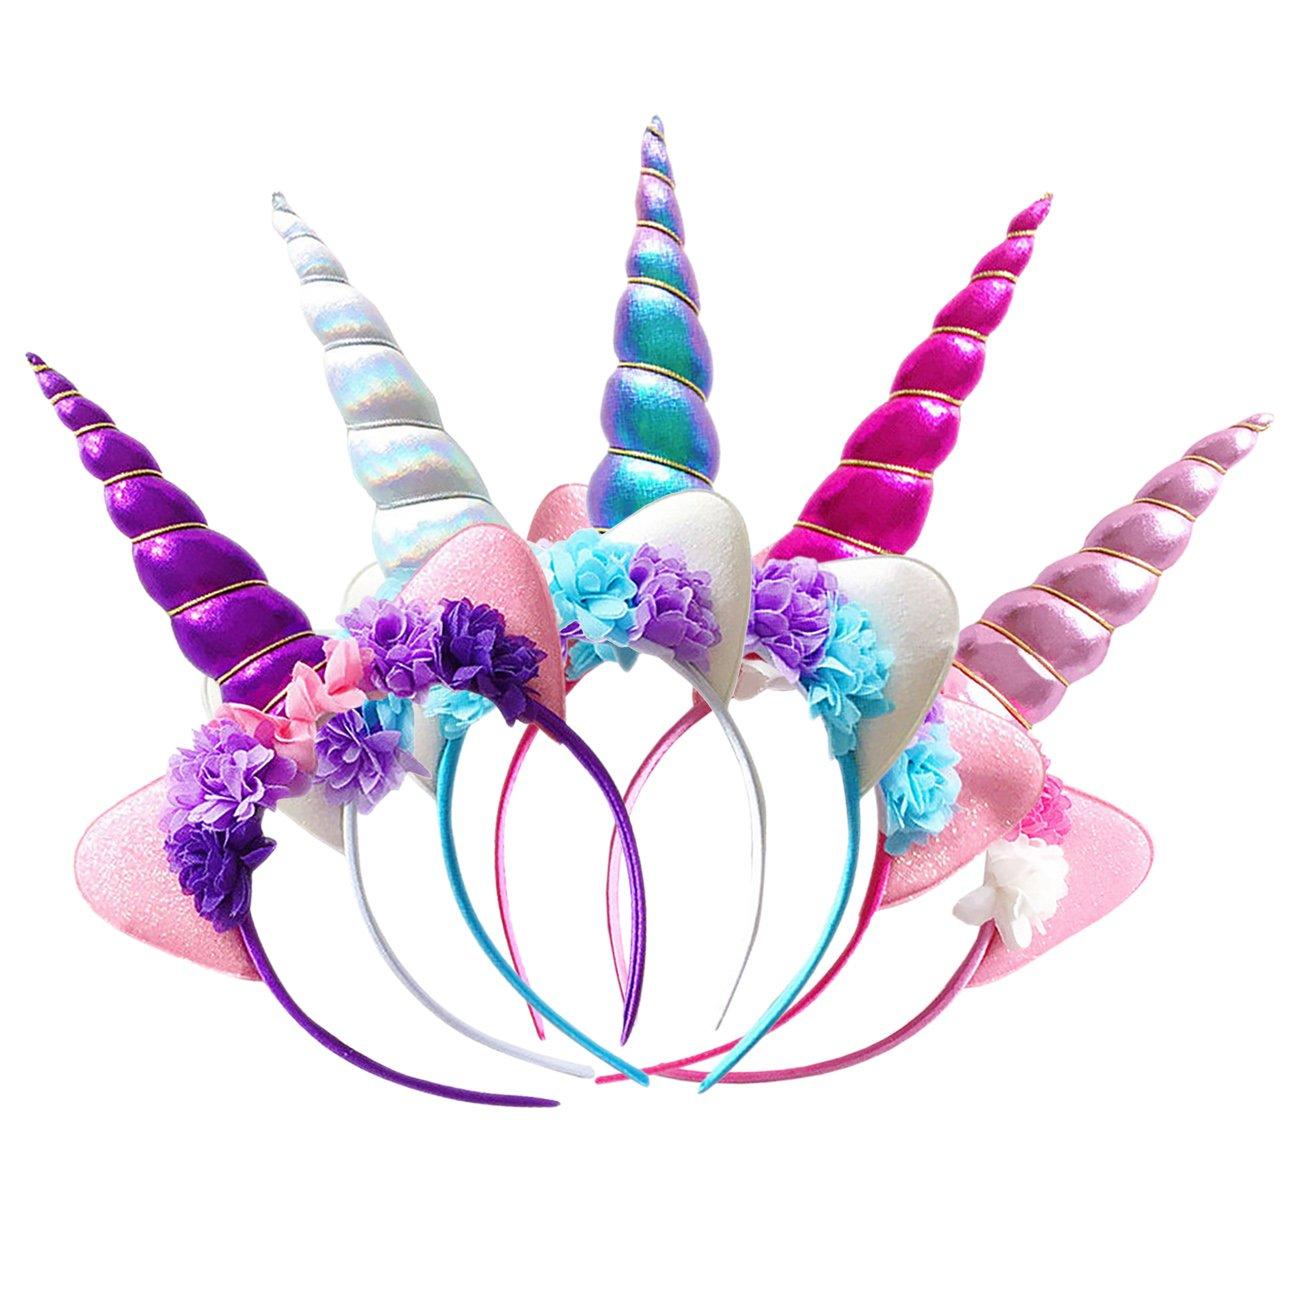 THEE 6pcs Tocado de Unicorn Diadema de Pelo Disfraz Decorativo